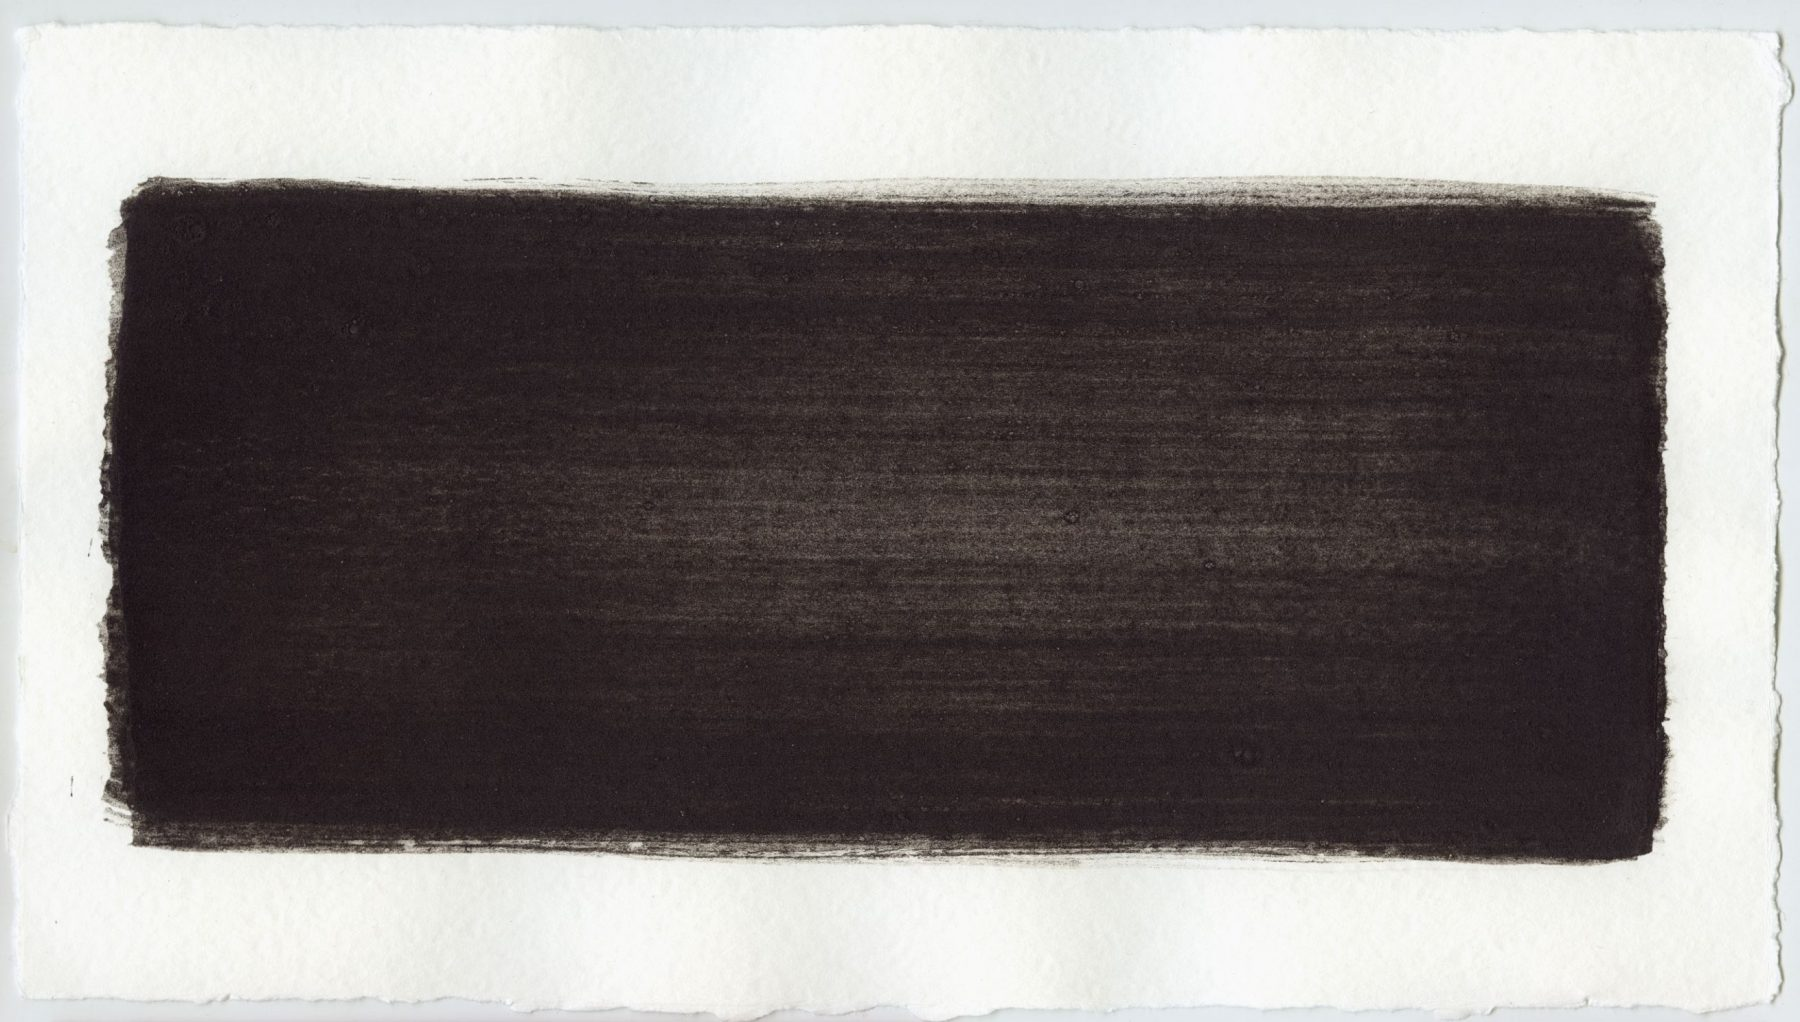 No. 15 MORTEL PAARSGRIJS MIDDEL - clay and iron oxide [burnt no. 3, 1260°C] - medium grind 18 September 2018 51° 42.213'N   5° 34.678'E